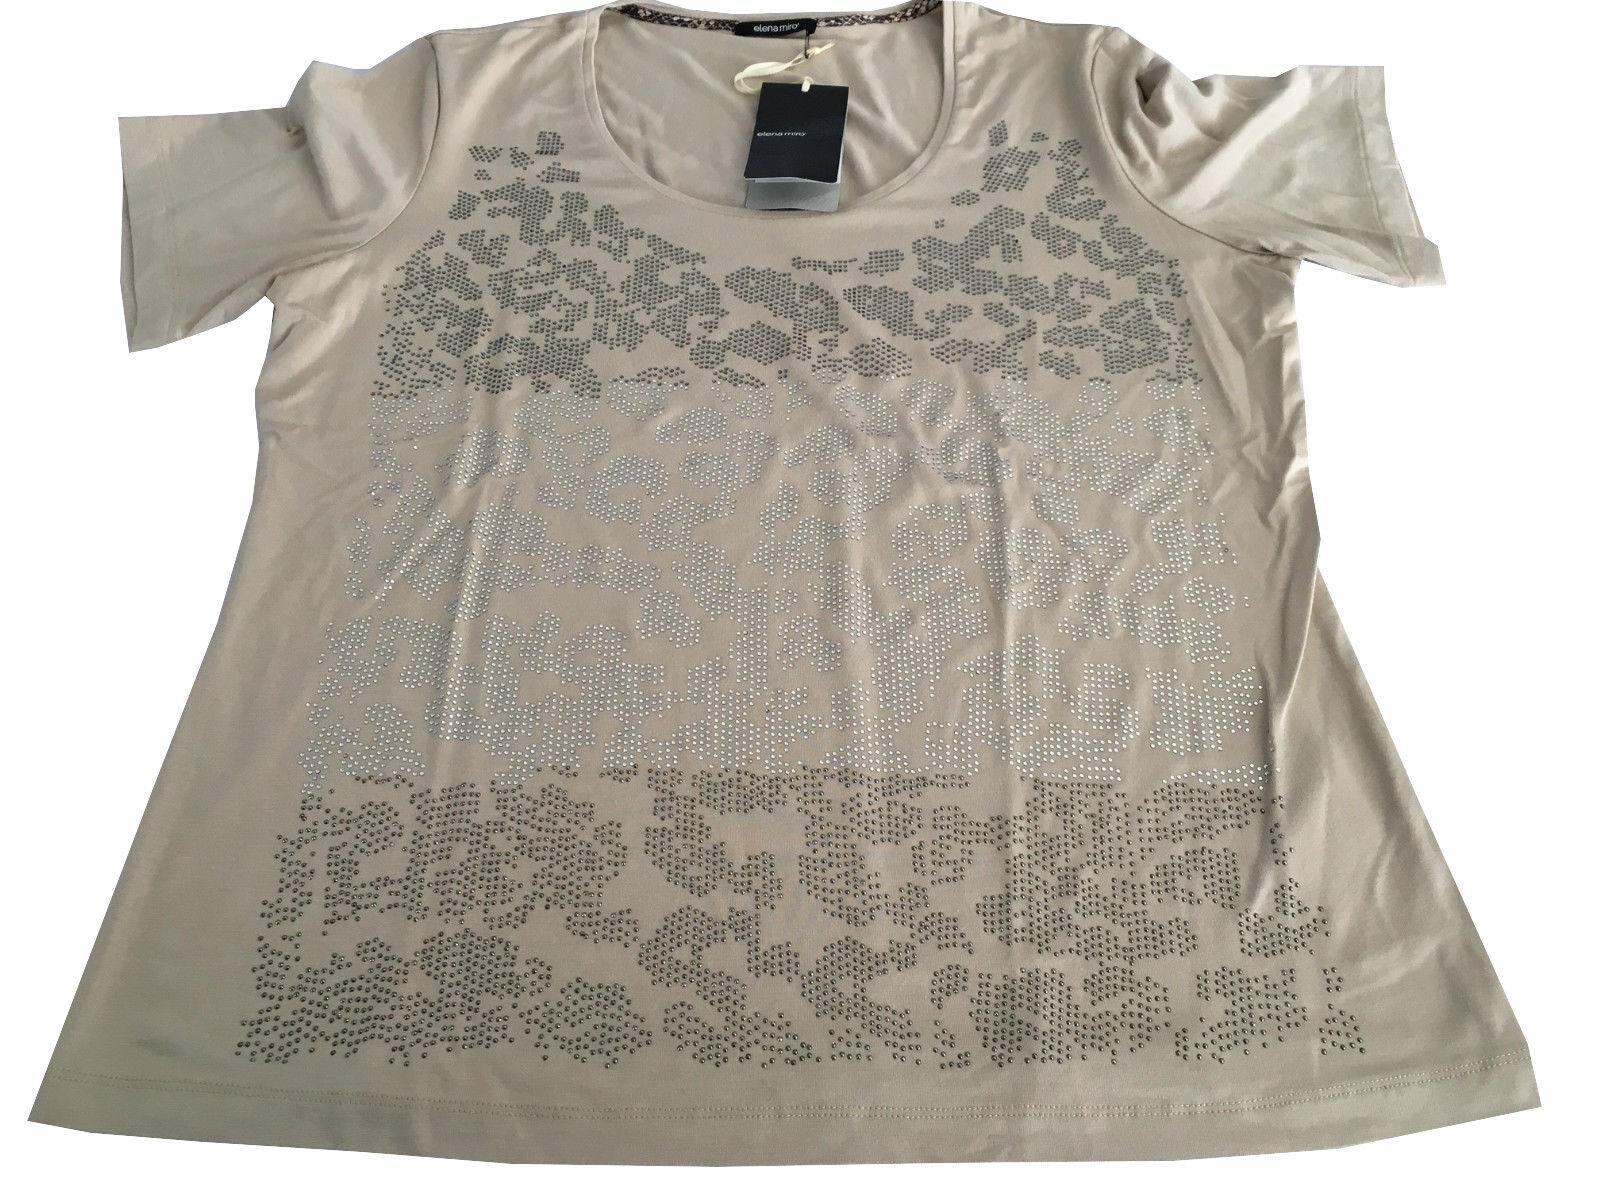 ELENA MIRO MIRO MIRO ' t - shirt donna mezza manica applicazioni strass 95% viscosa 00233d